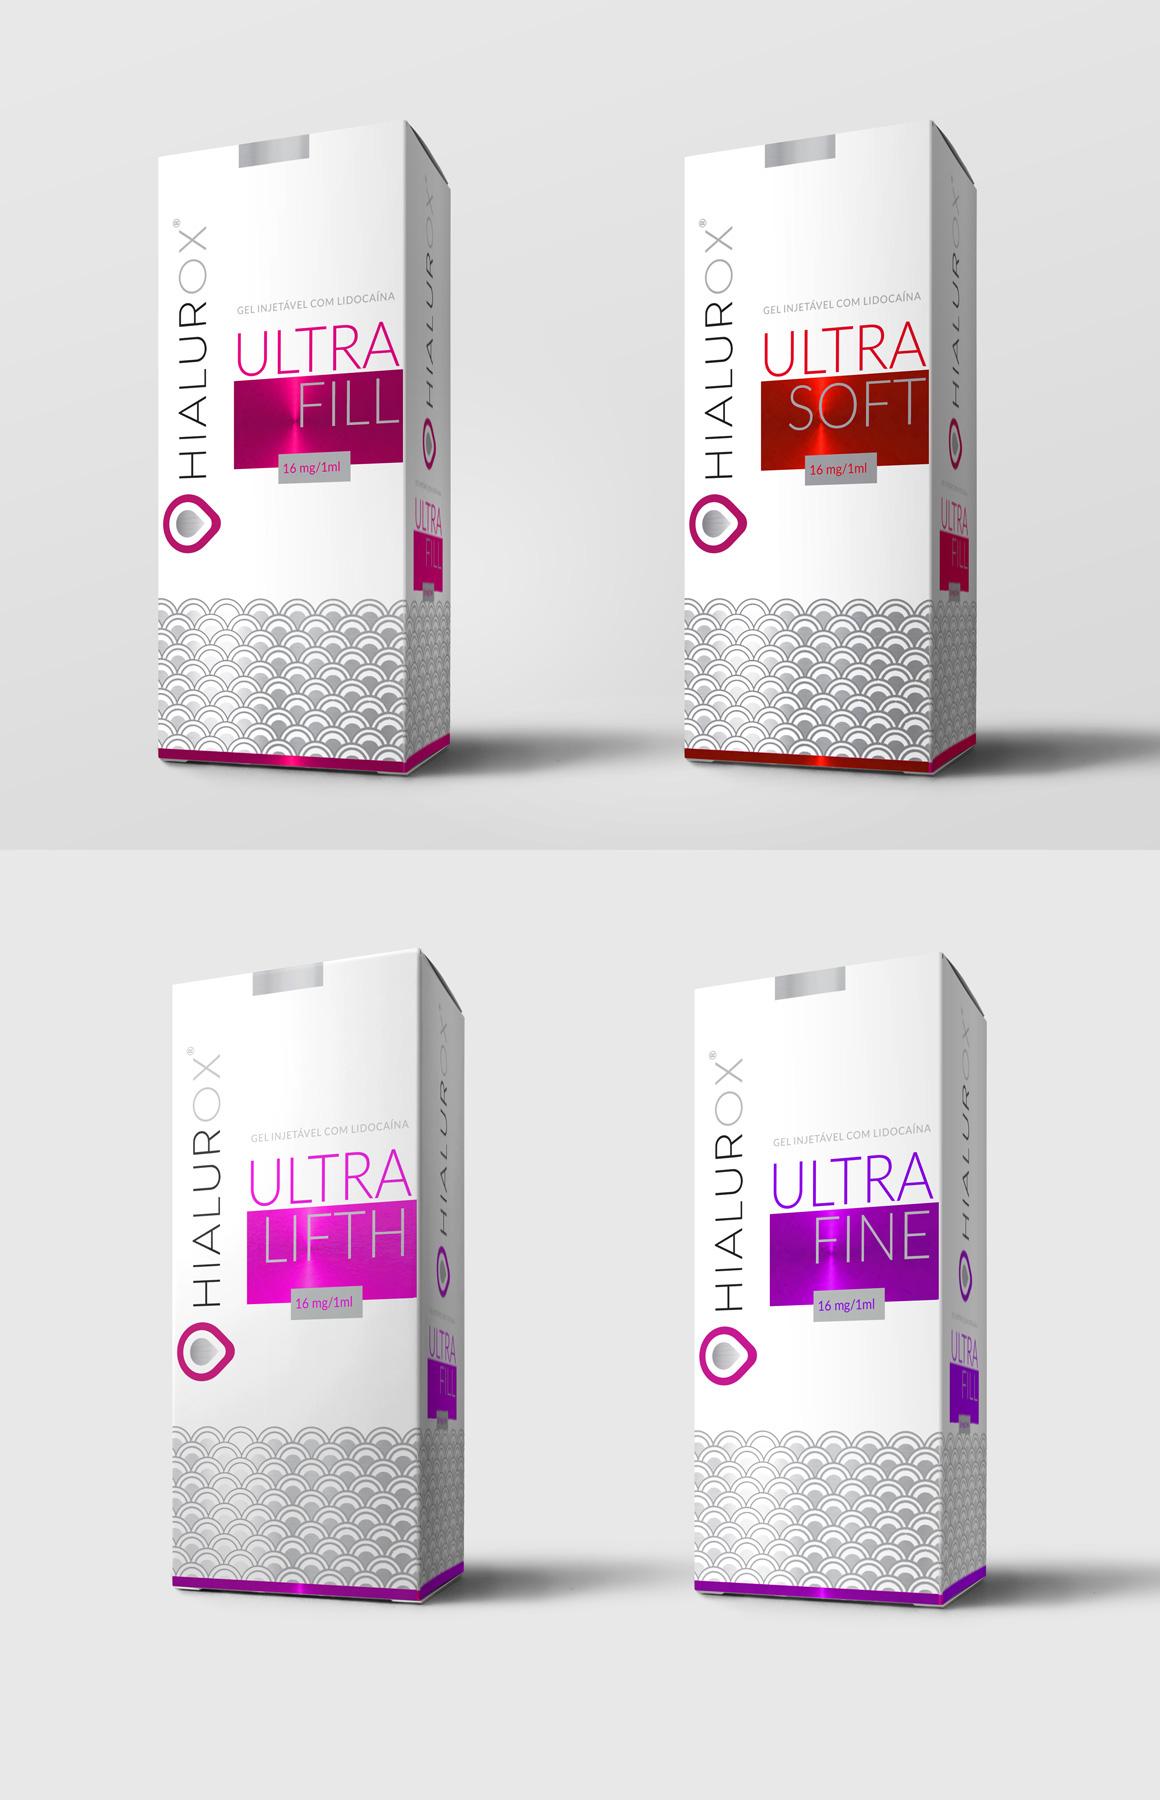 Noodles Design – Hialurox packaging